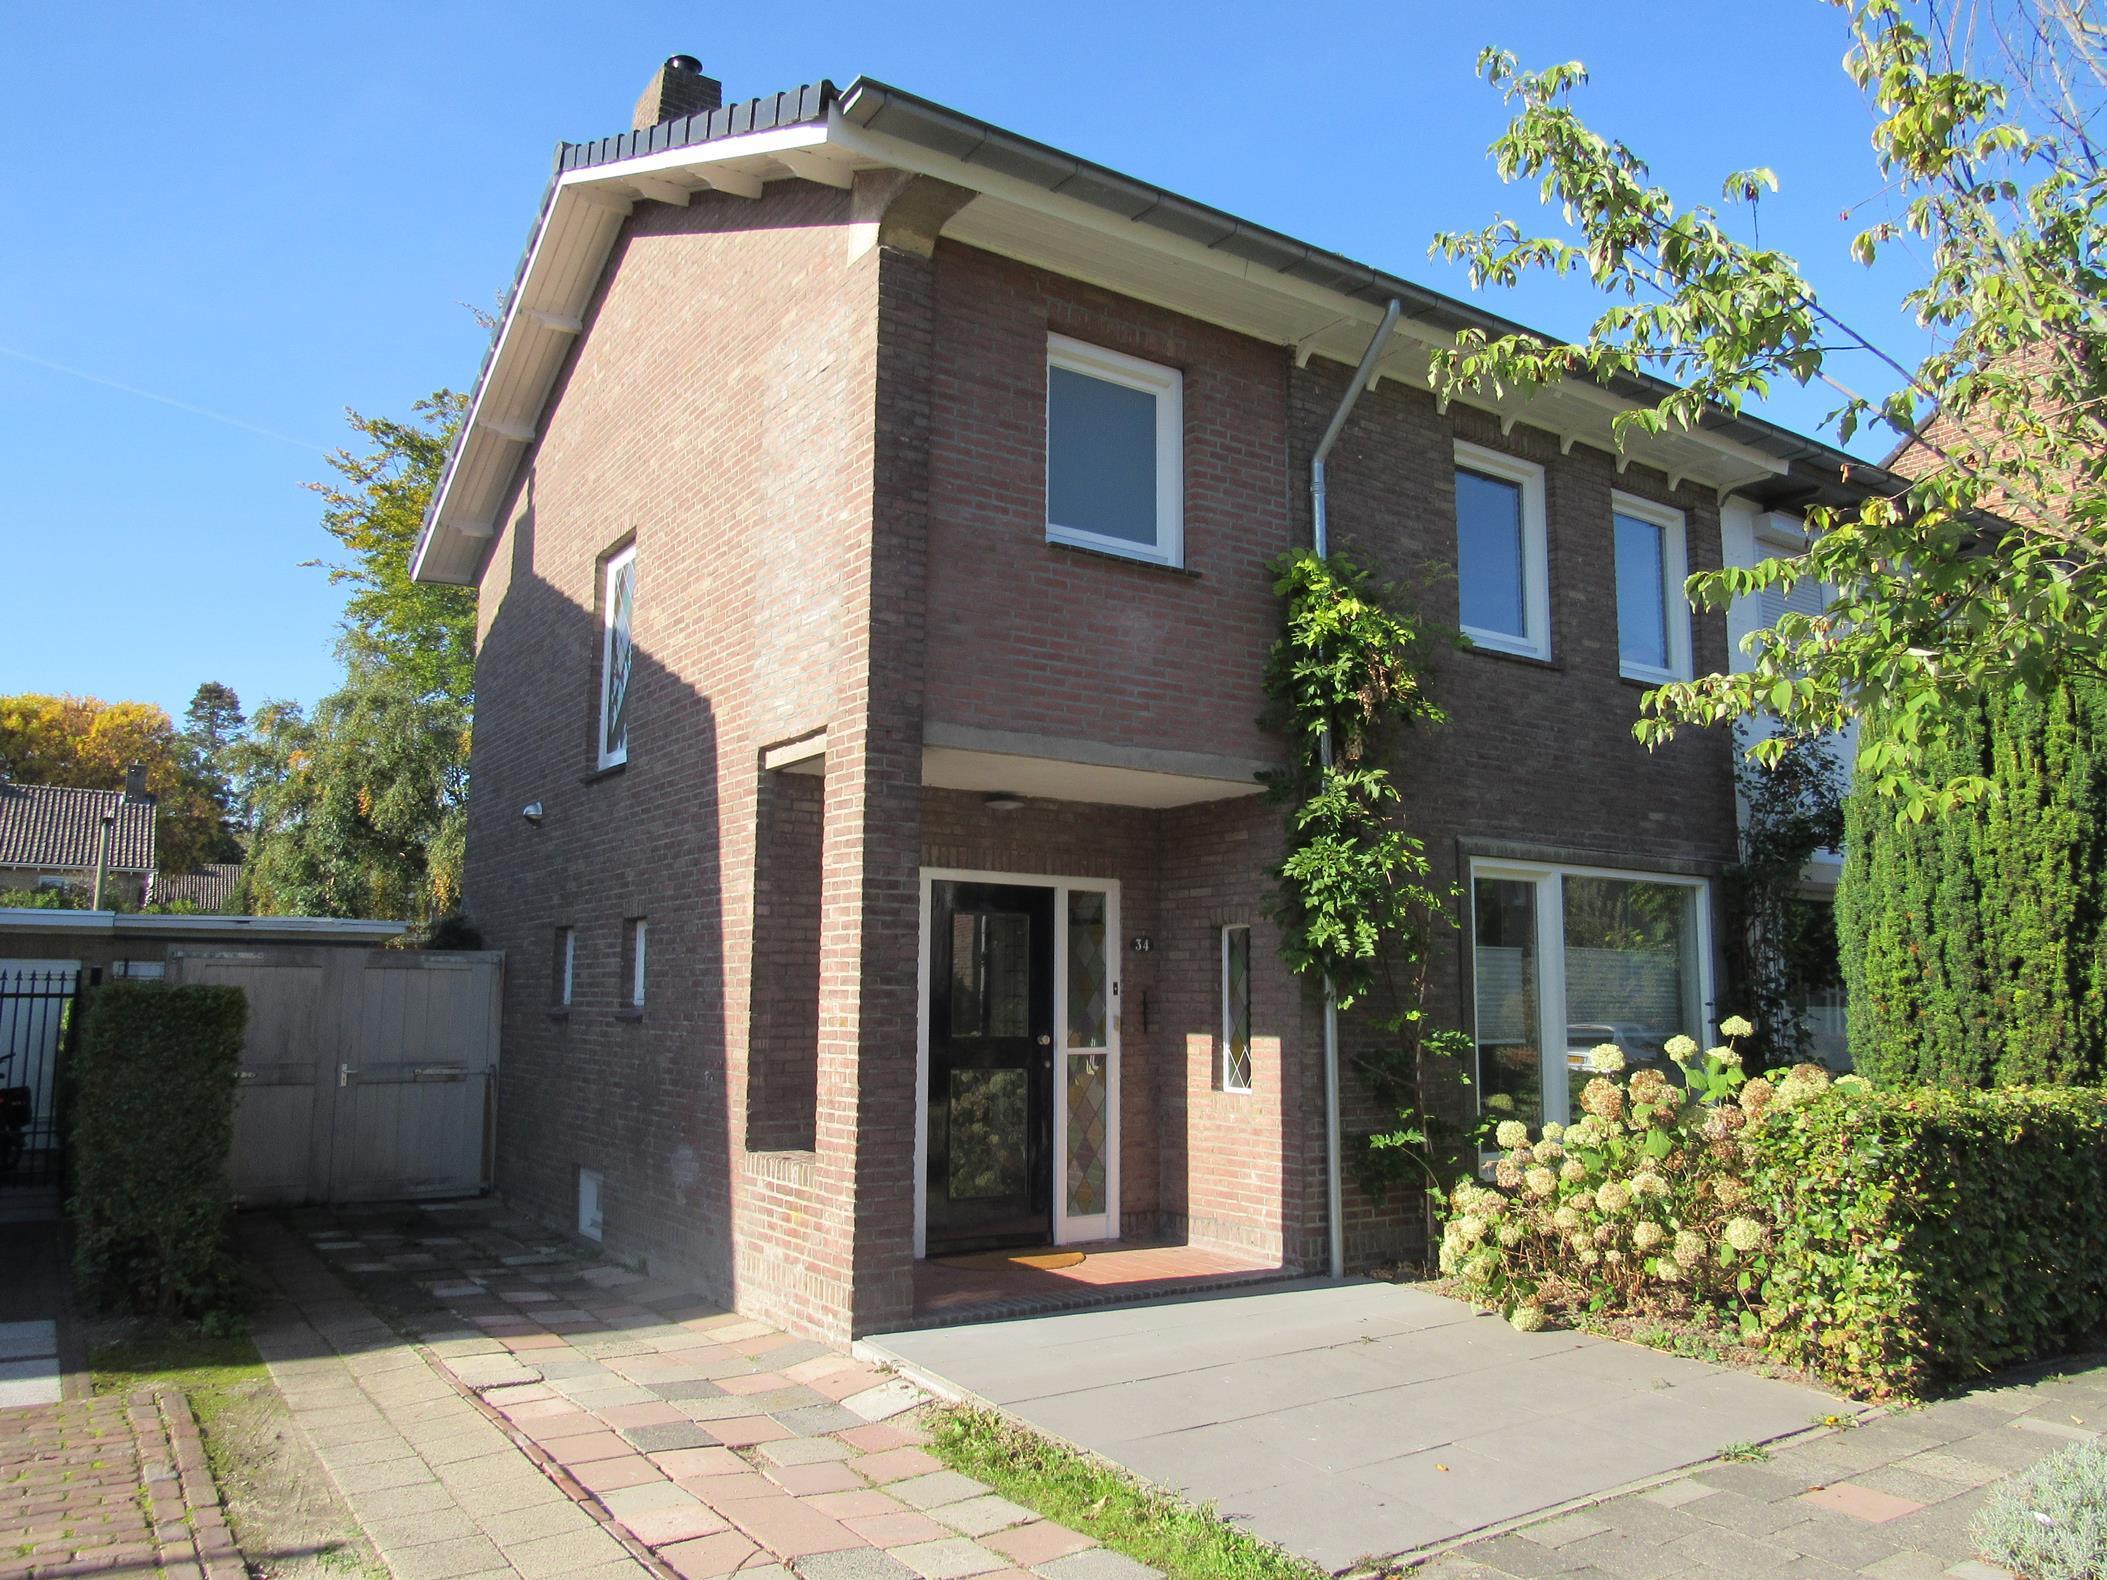 Kalfstraat, Maastricht